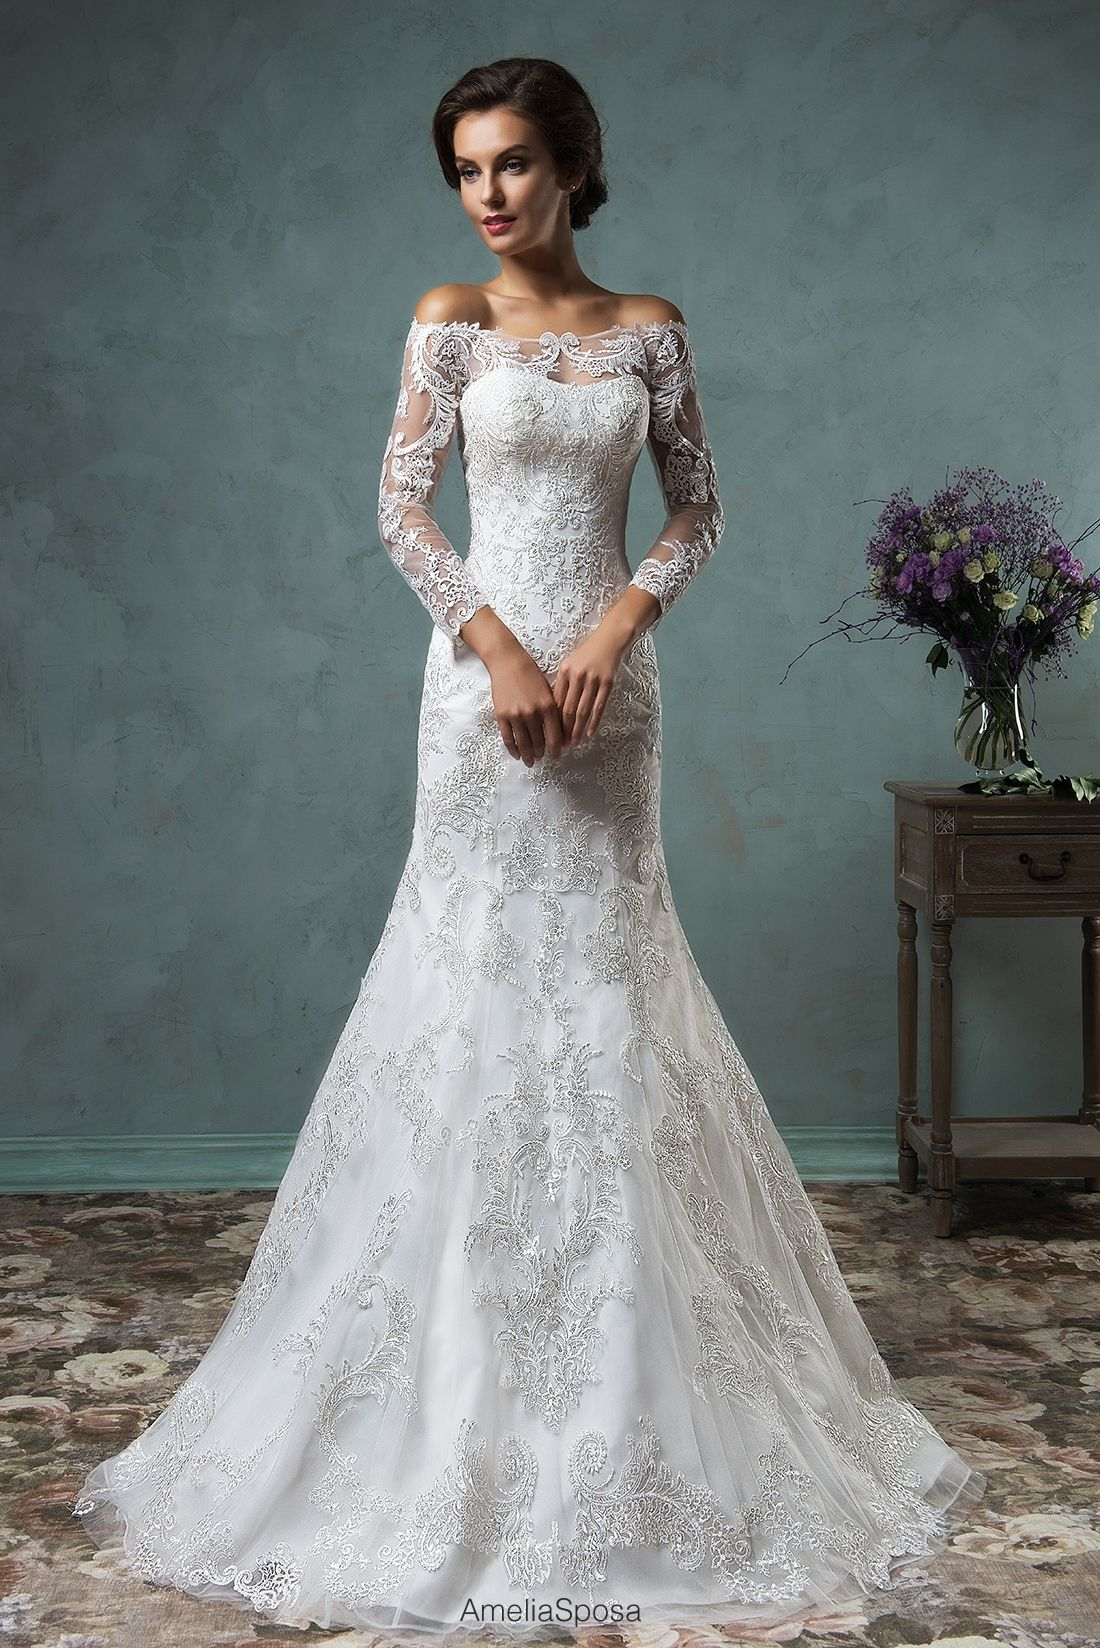 Off the shoulder lace mermaid wedding dress  Wedding dress Celeste  wedding dresses  Pinterest  Wedding dress